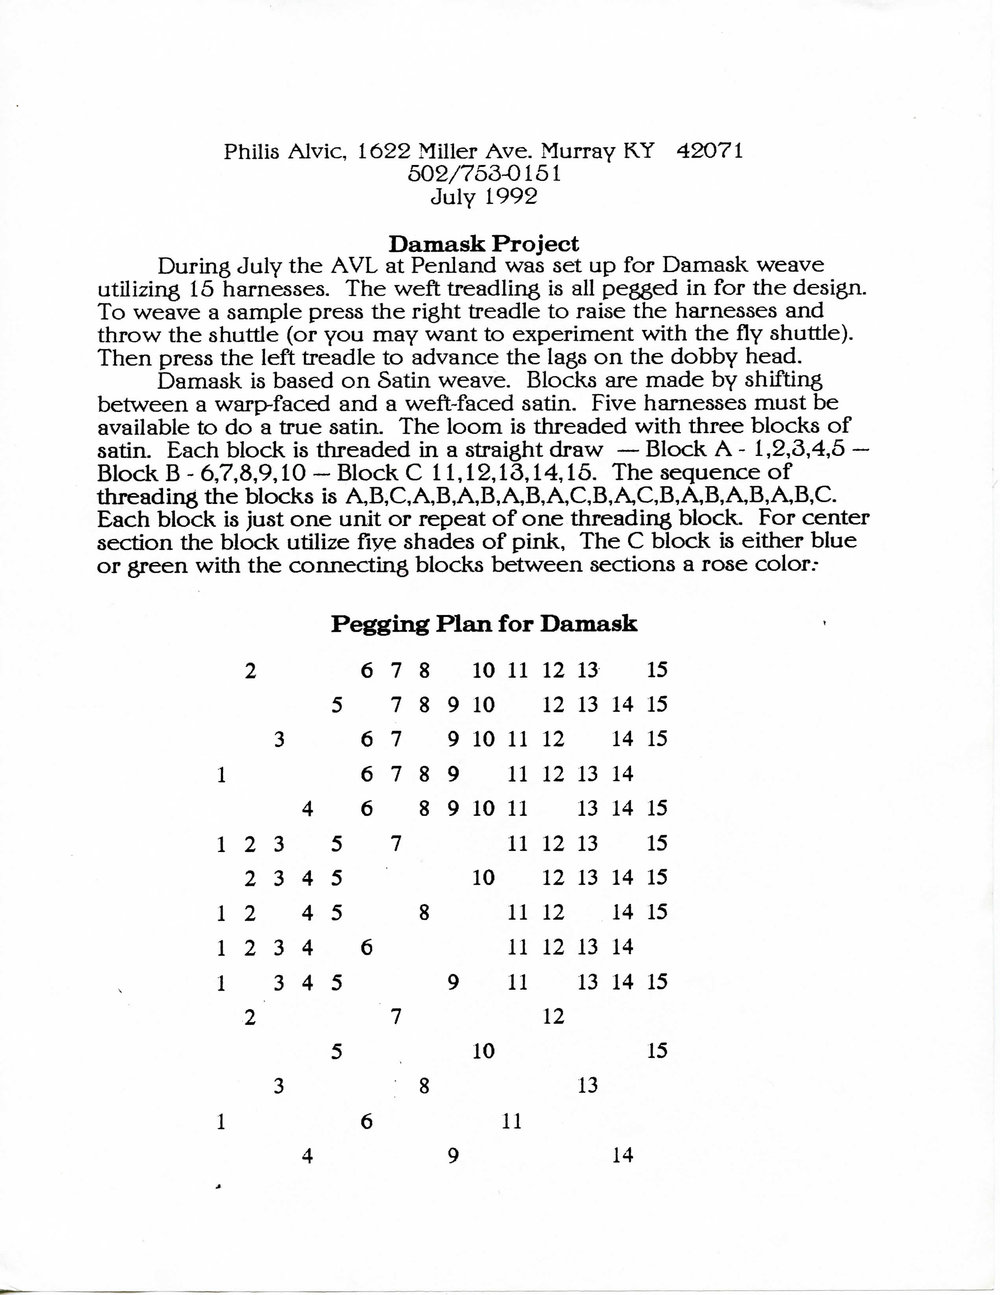 1992_Page_2_Image_0001.jpg